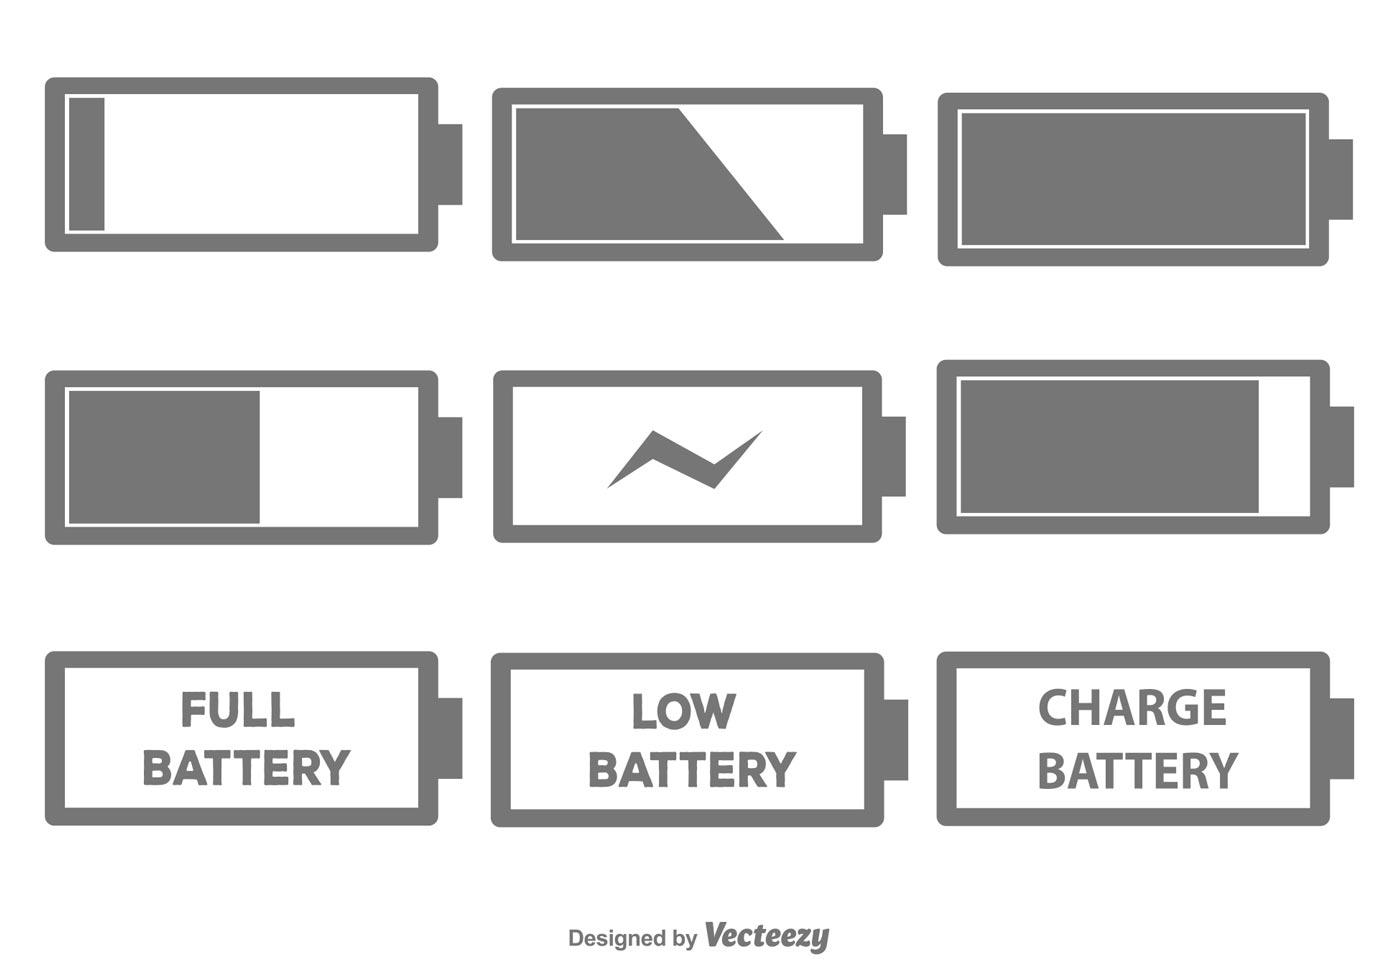 Batterie Icon Set - Kostenlose Vektor-Kunst, Archiv-Grafiken ...